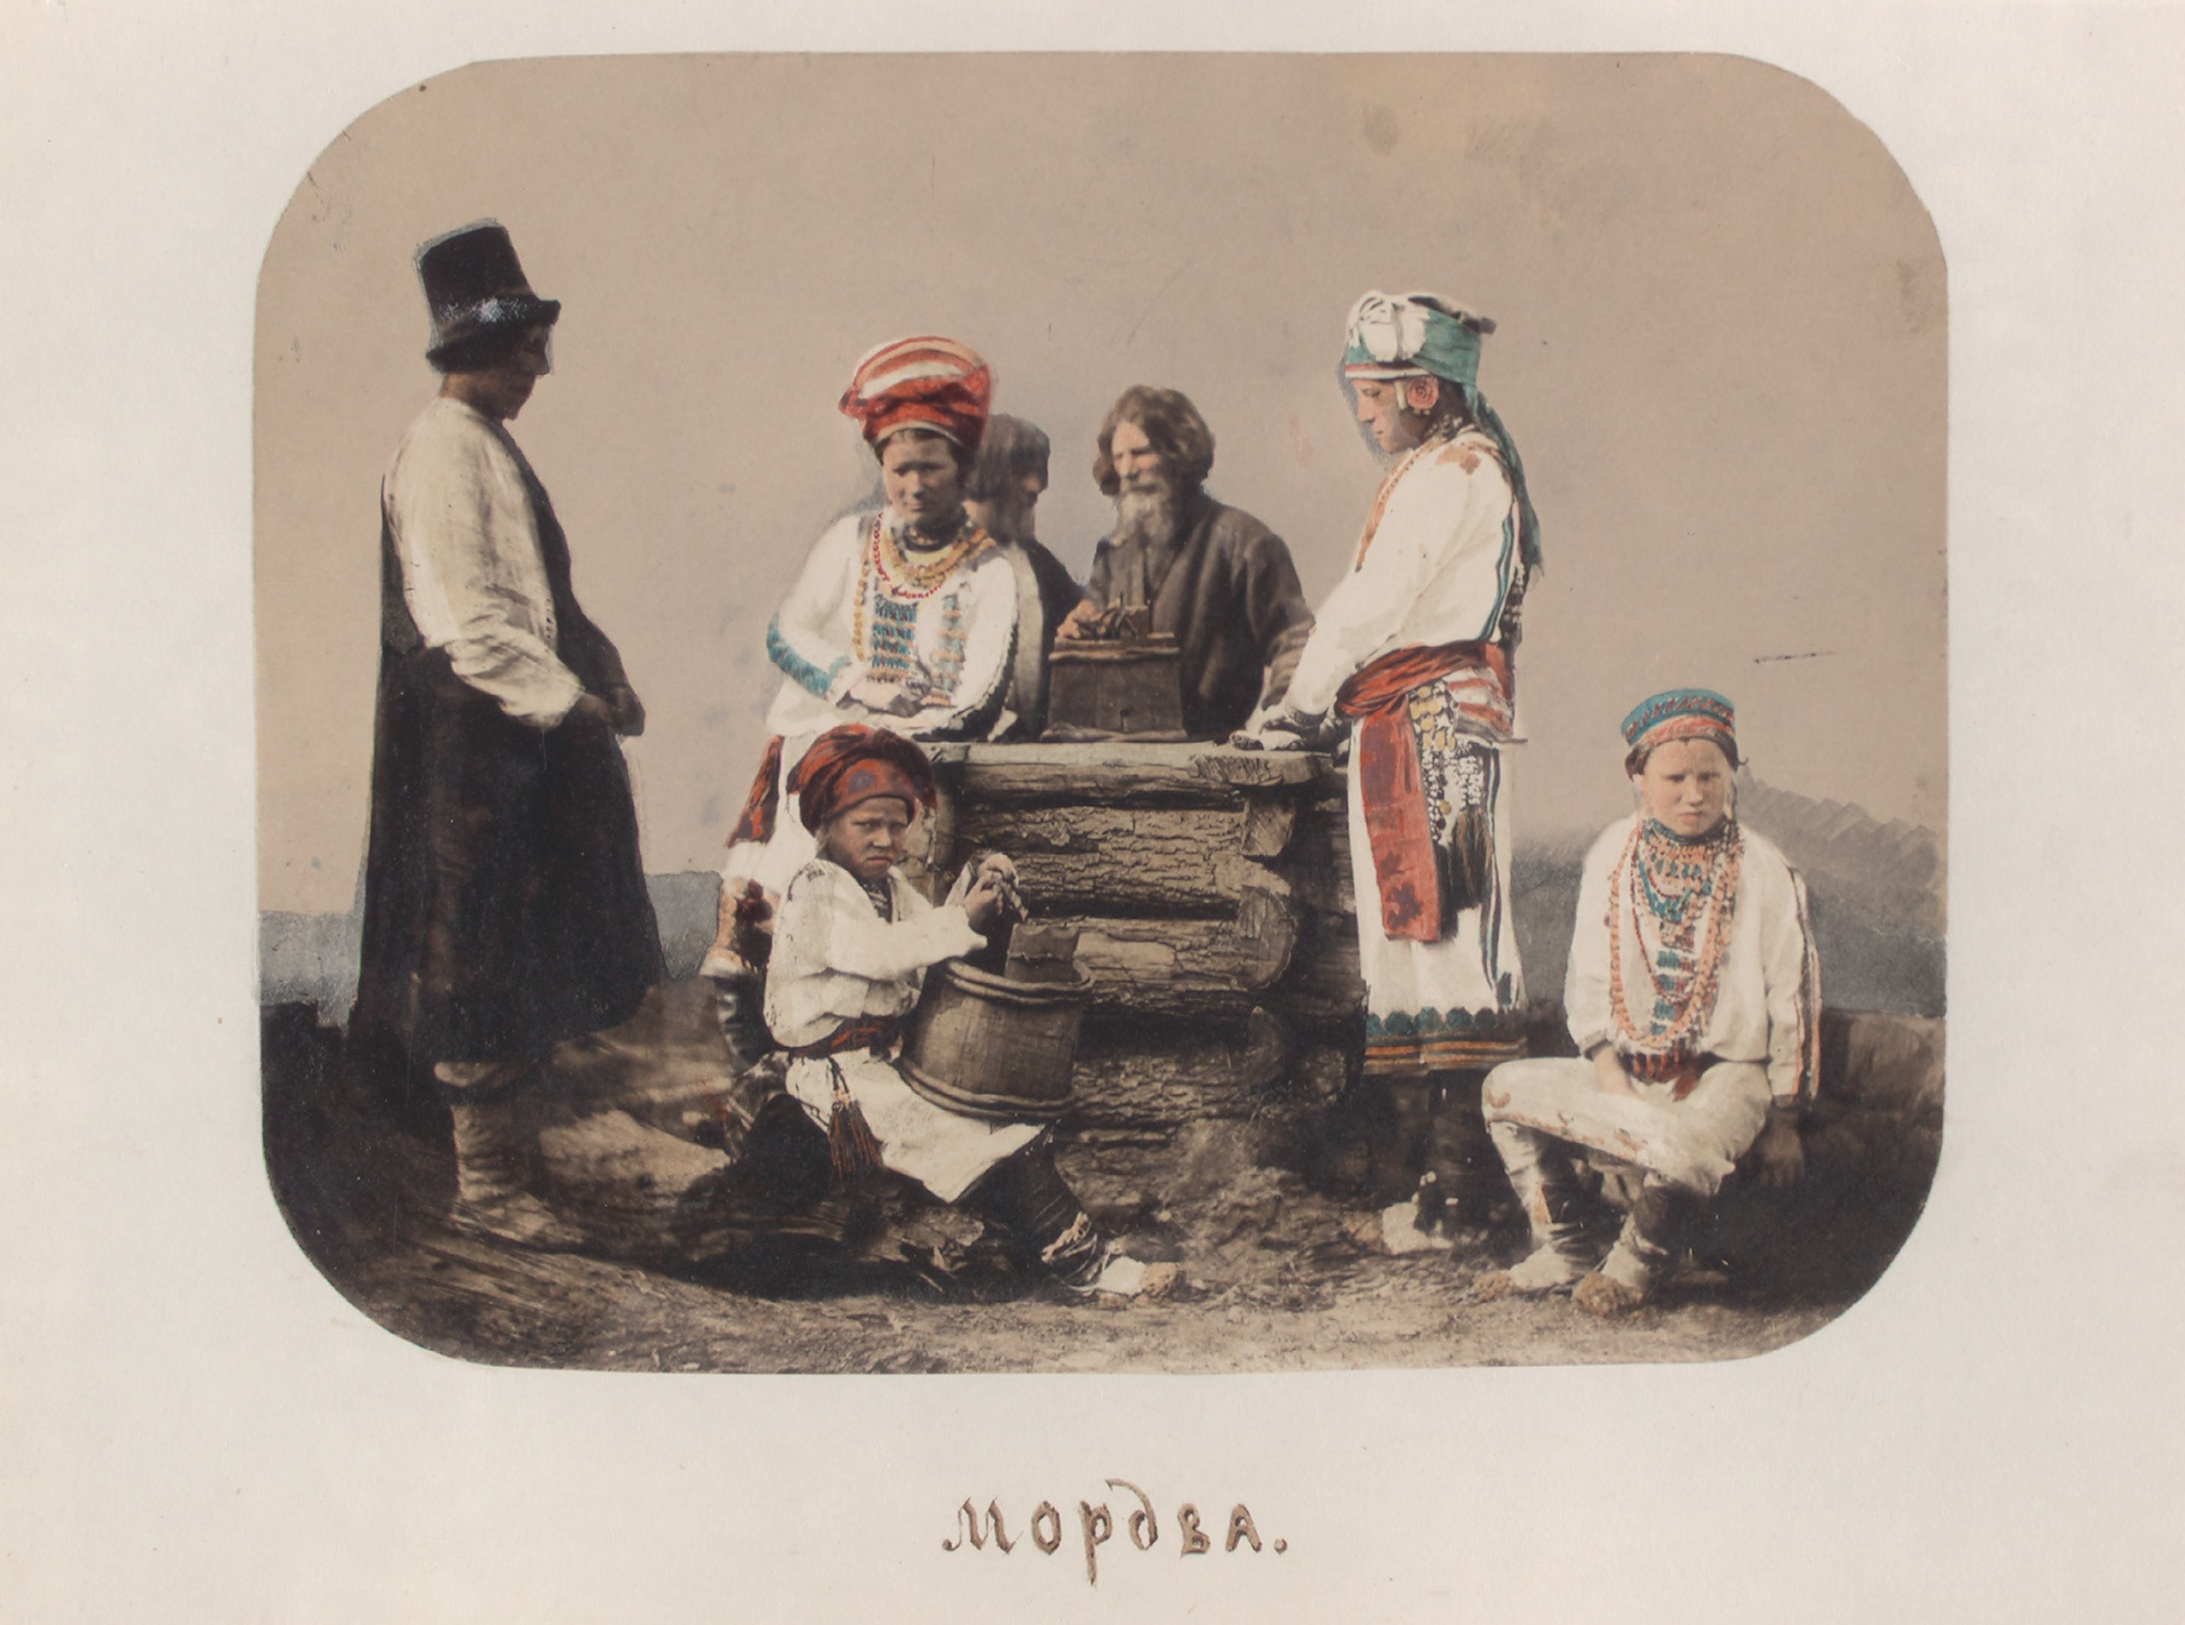 Bevölkerung Pensa Russland 1862 NYPL 10